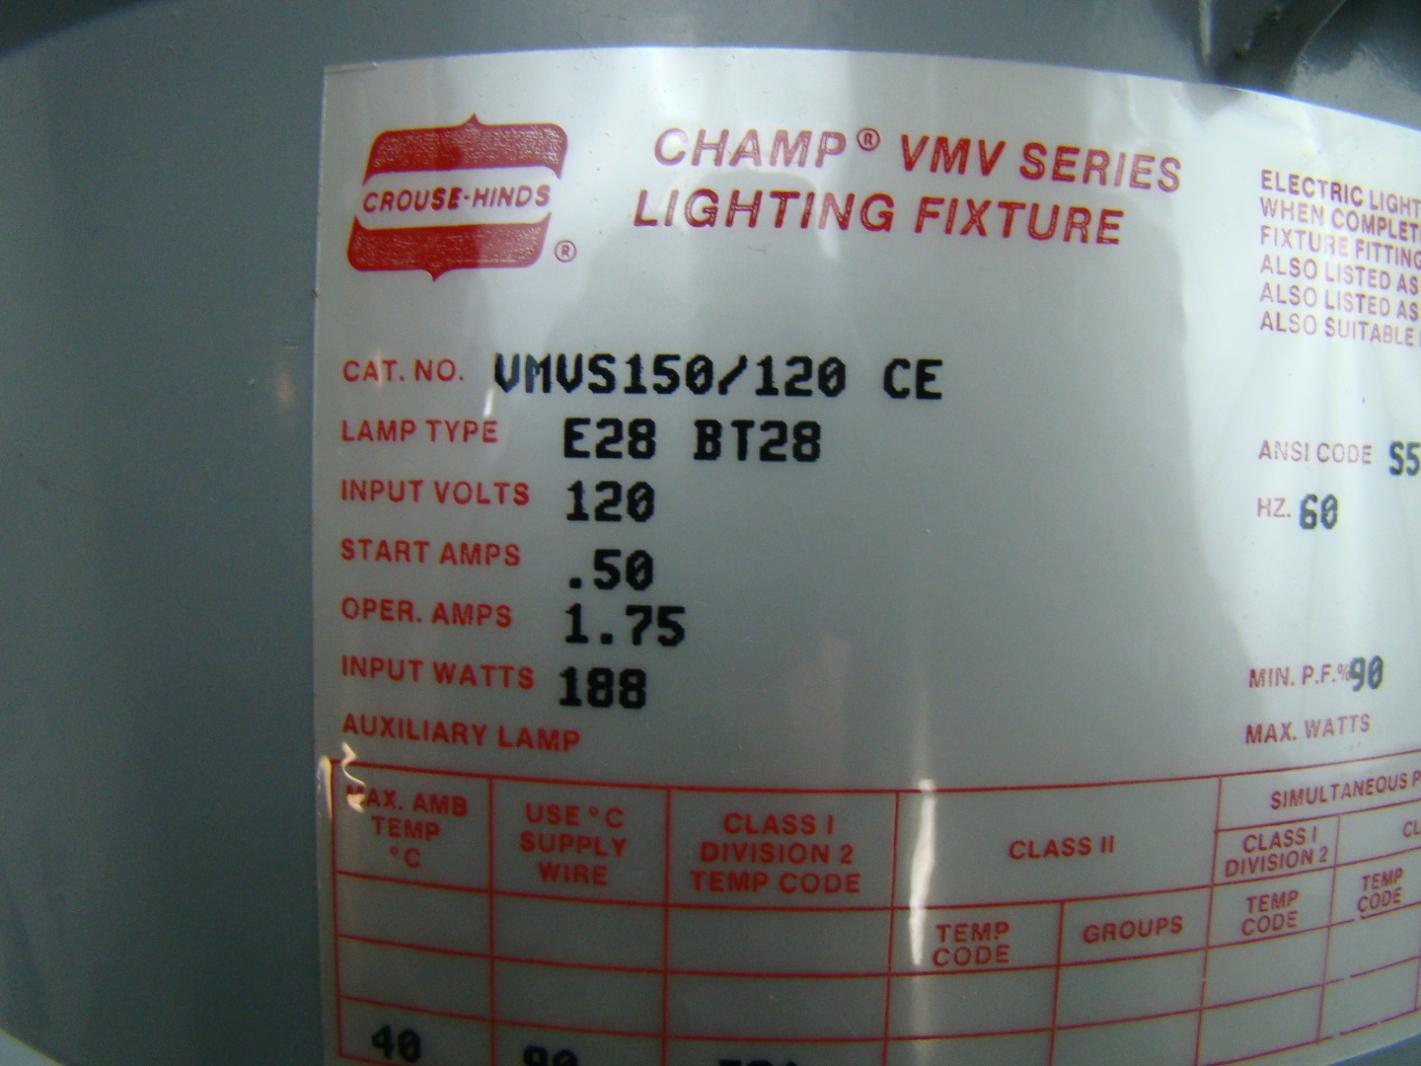 Crouse hinds champ hid lighting fixture 120v 150w vmvs150120 ce crouse hinds champ hid lighting fixture 120v 150w vmvs150120 ce arubaitofo Choice Image